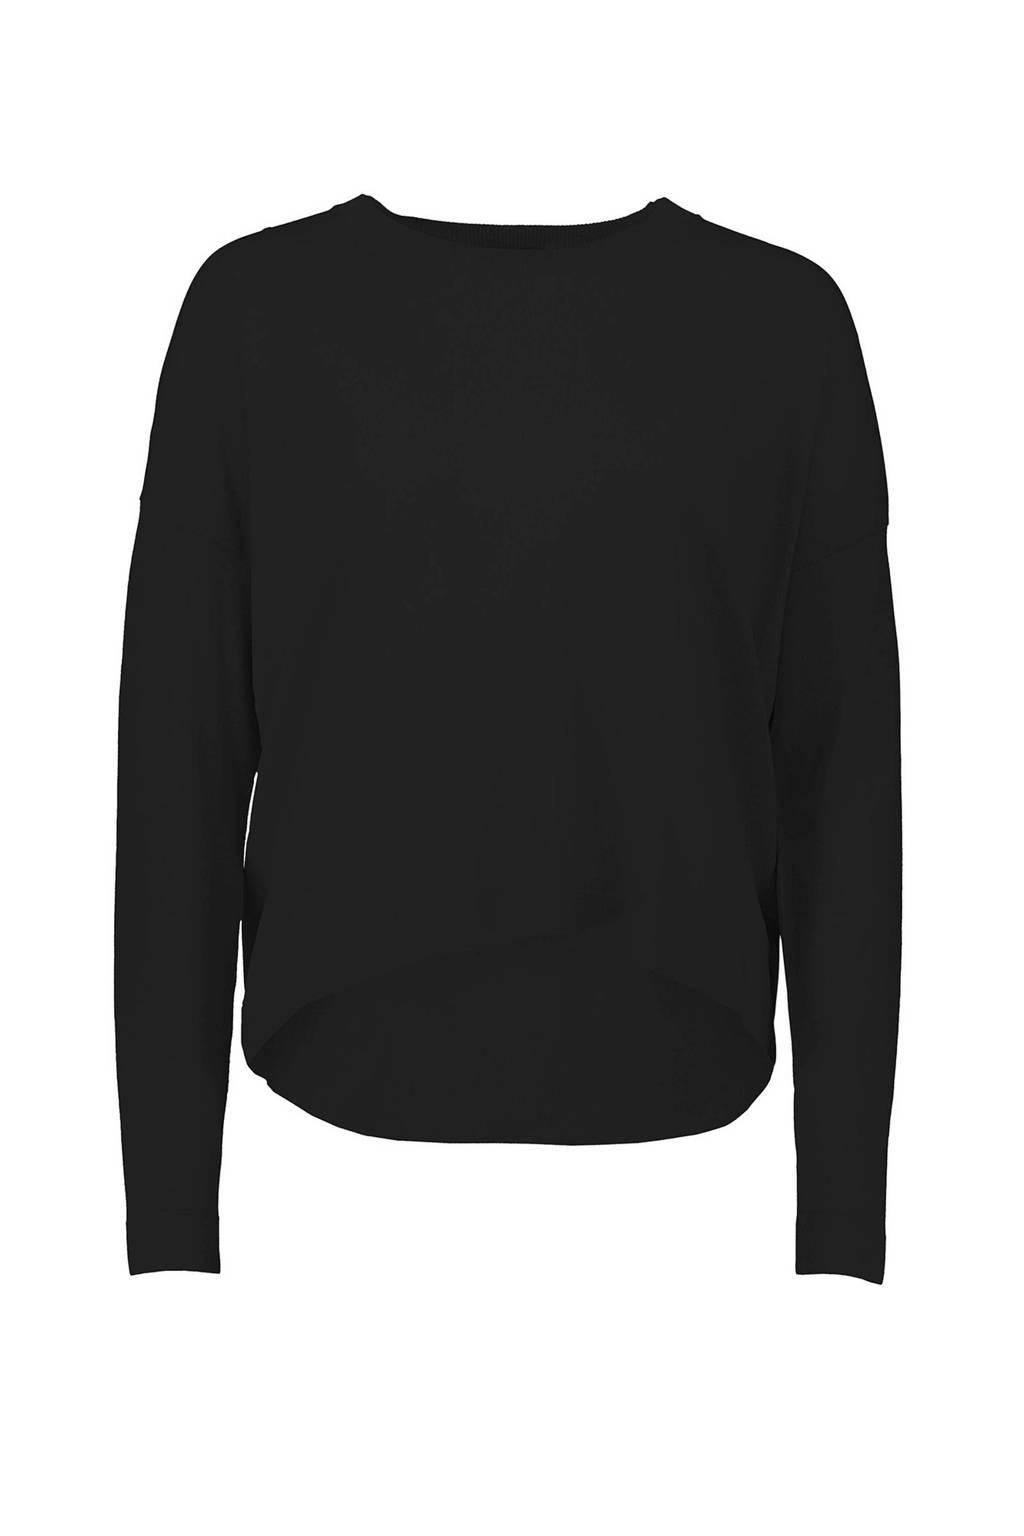 Sissy-Boy trui, Zwart